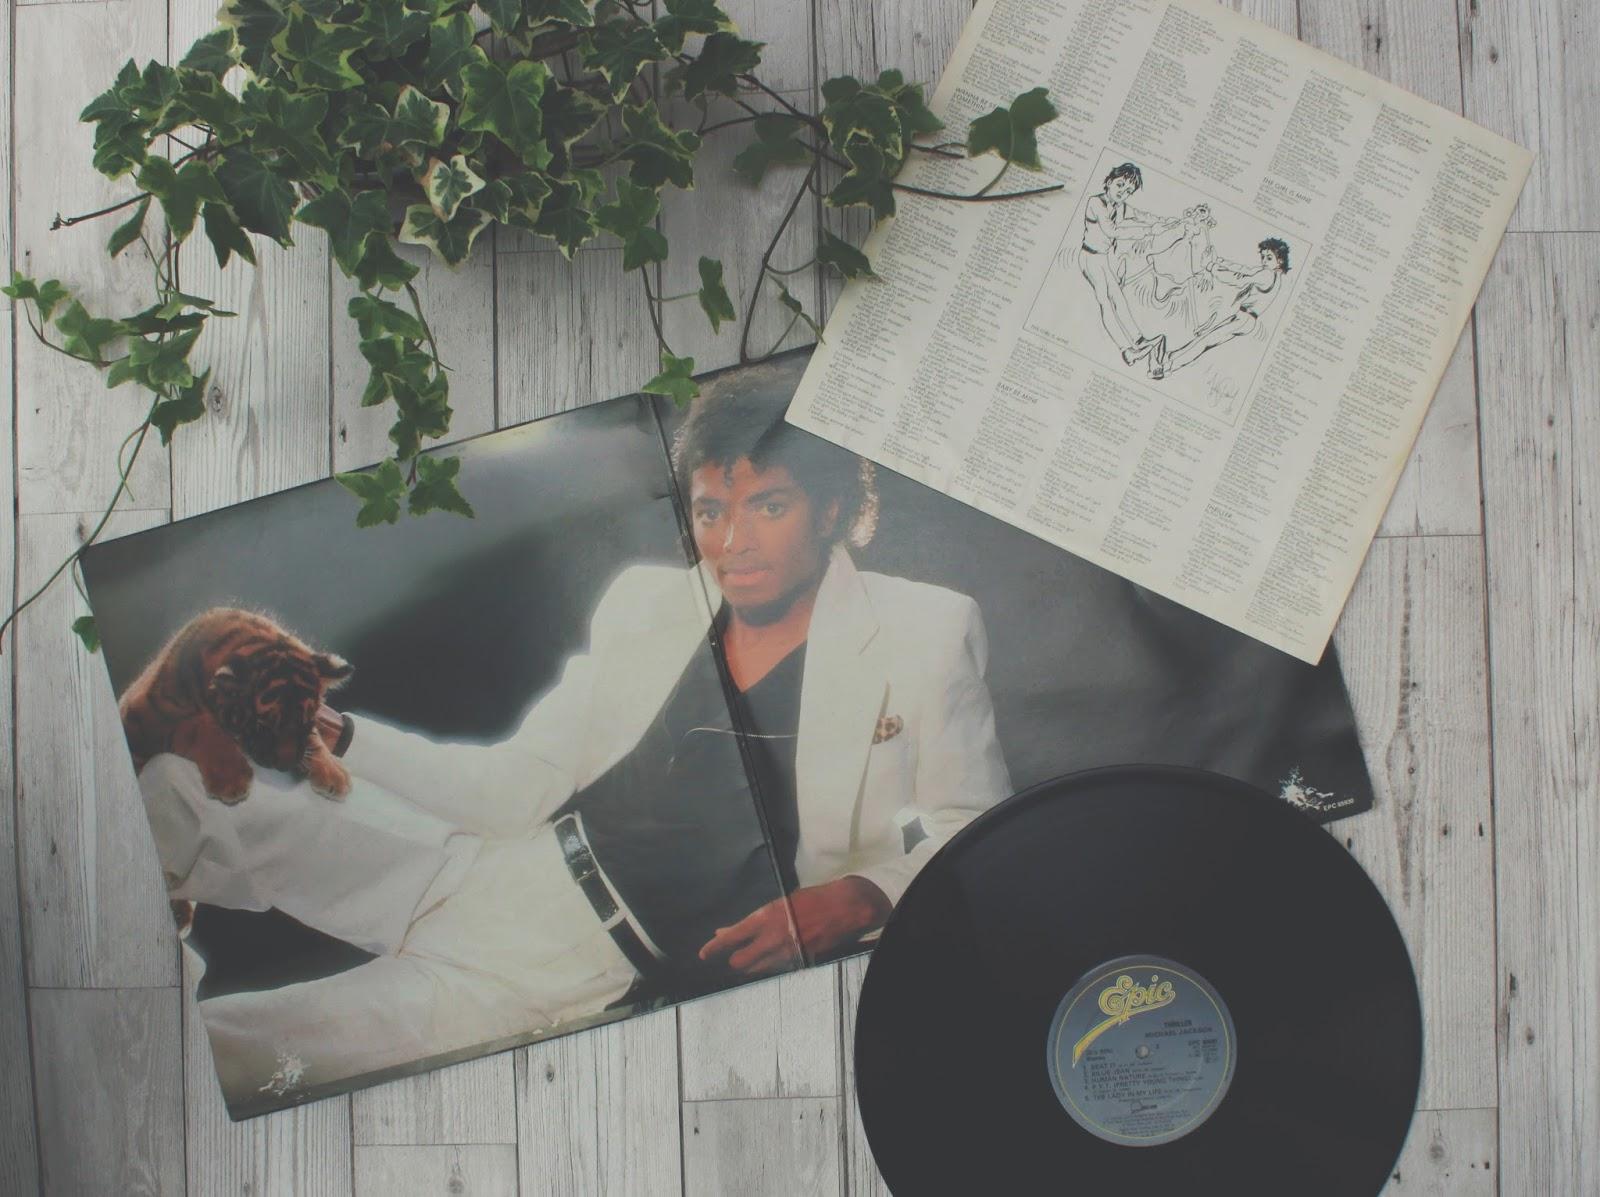 Mummy and Harrison   Fashion & Lifestyle Blogger   Top 5 Records   Michael Jackson